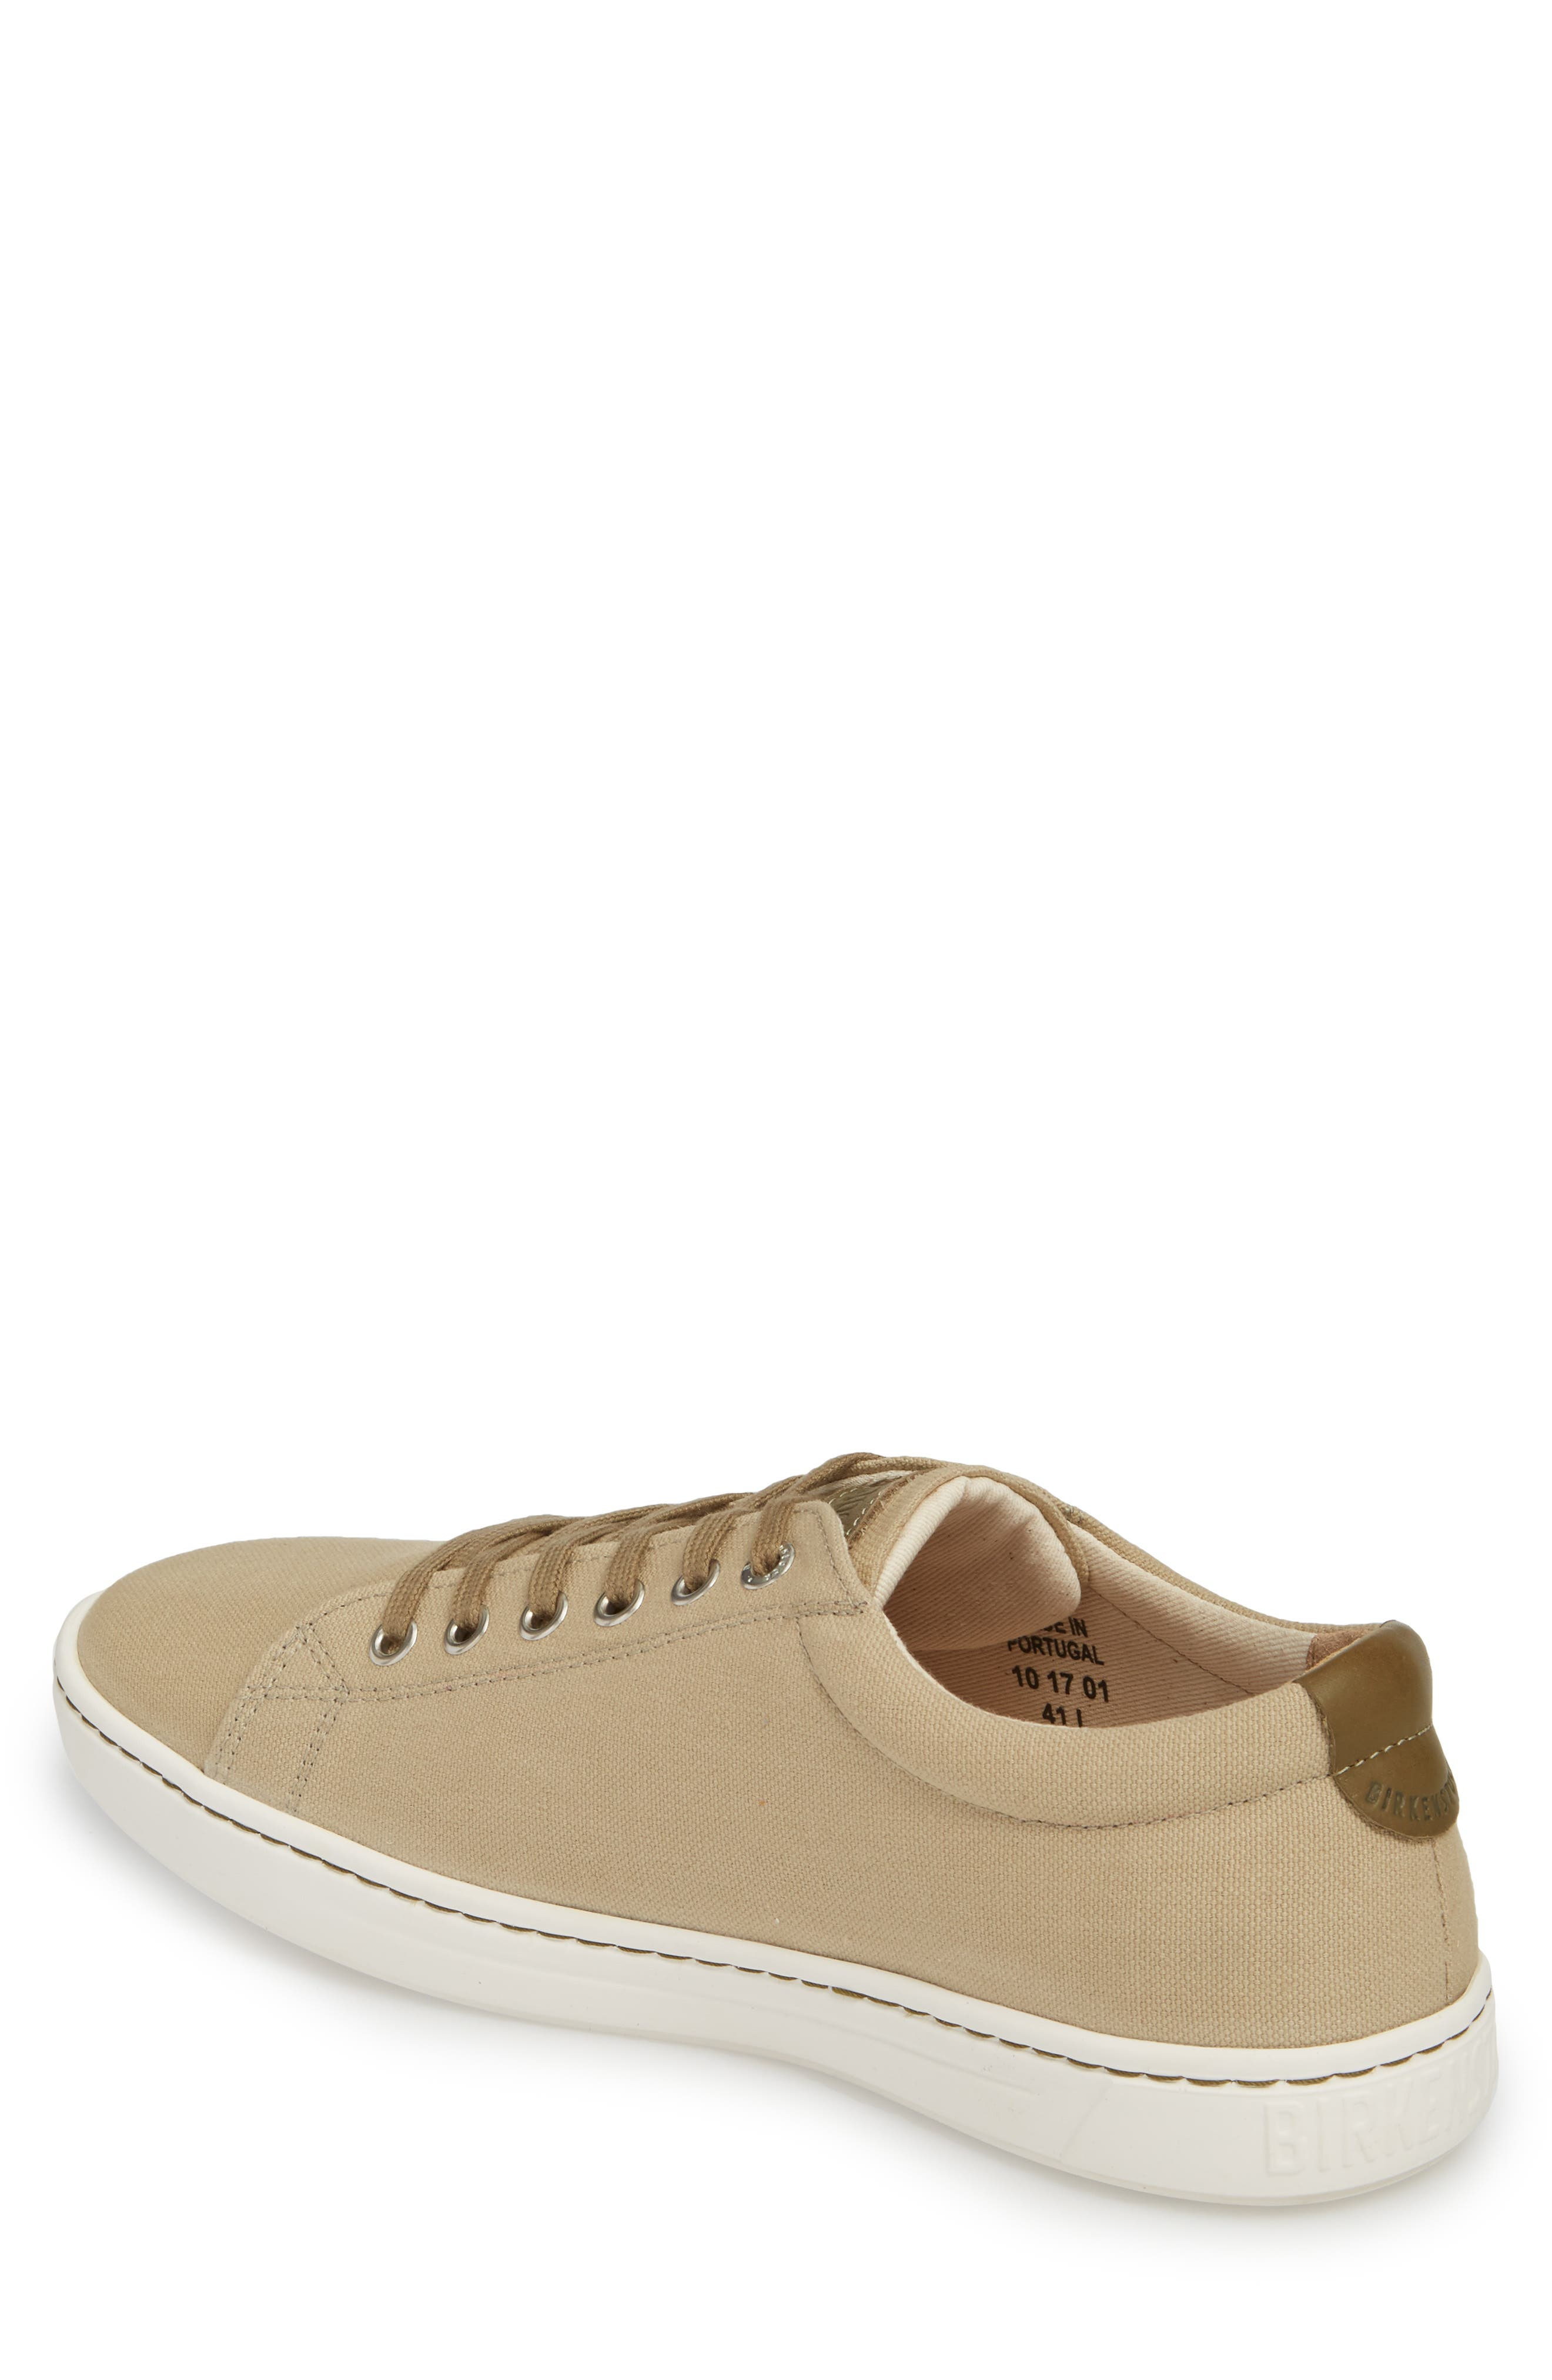 Arran Sneaker,                             Alternate thumbnail 2, color,                             Khaki Canvas